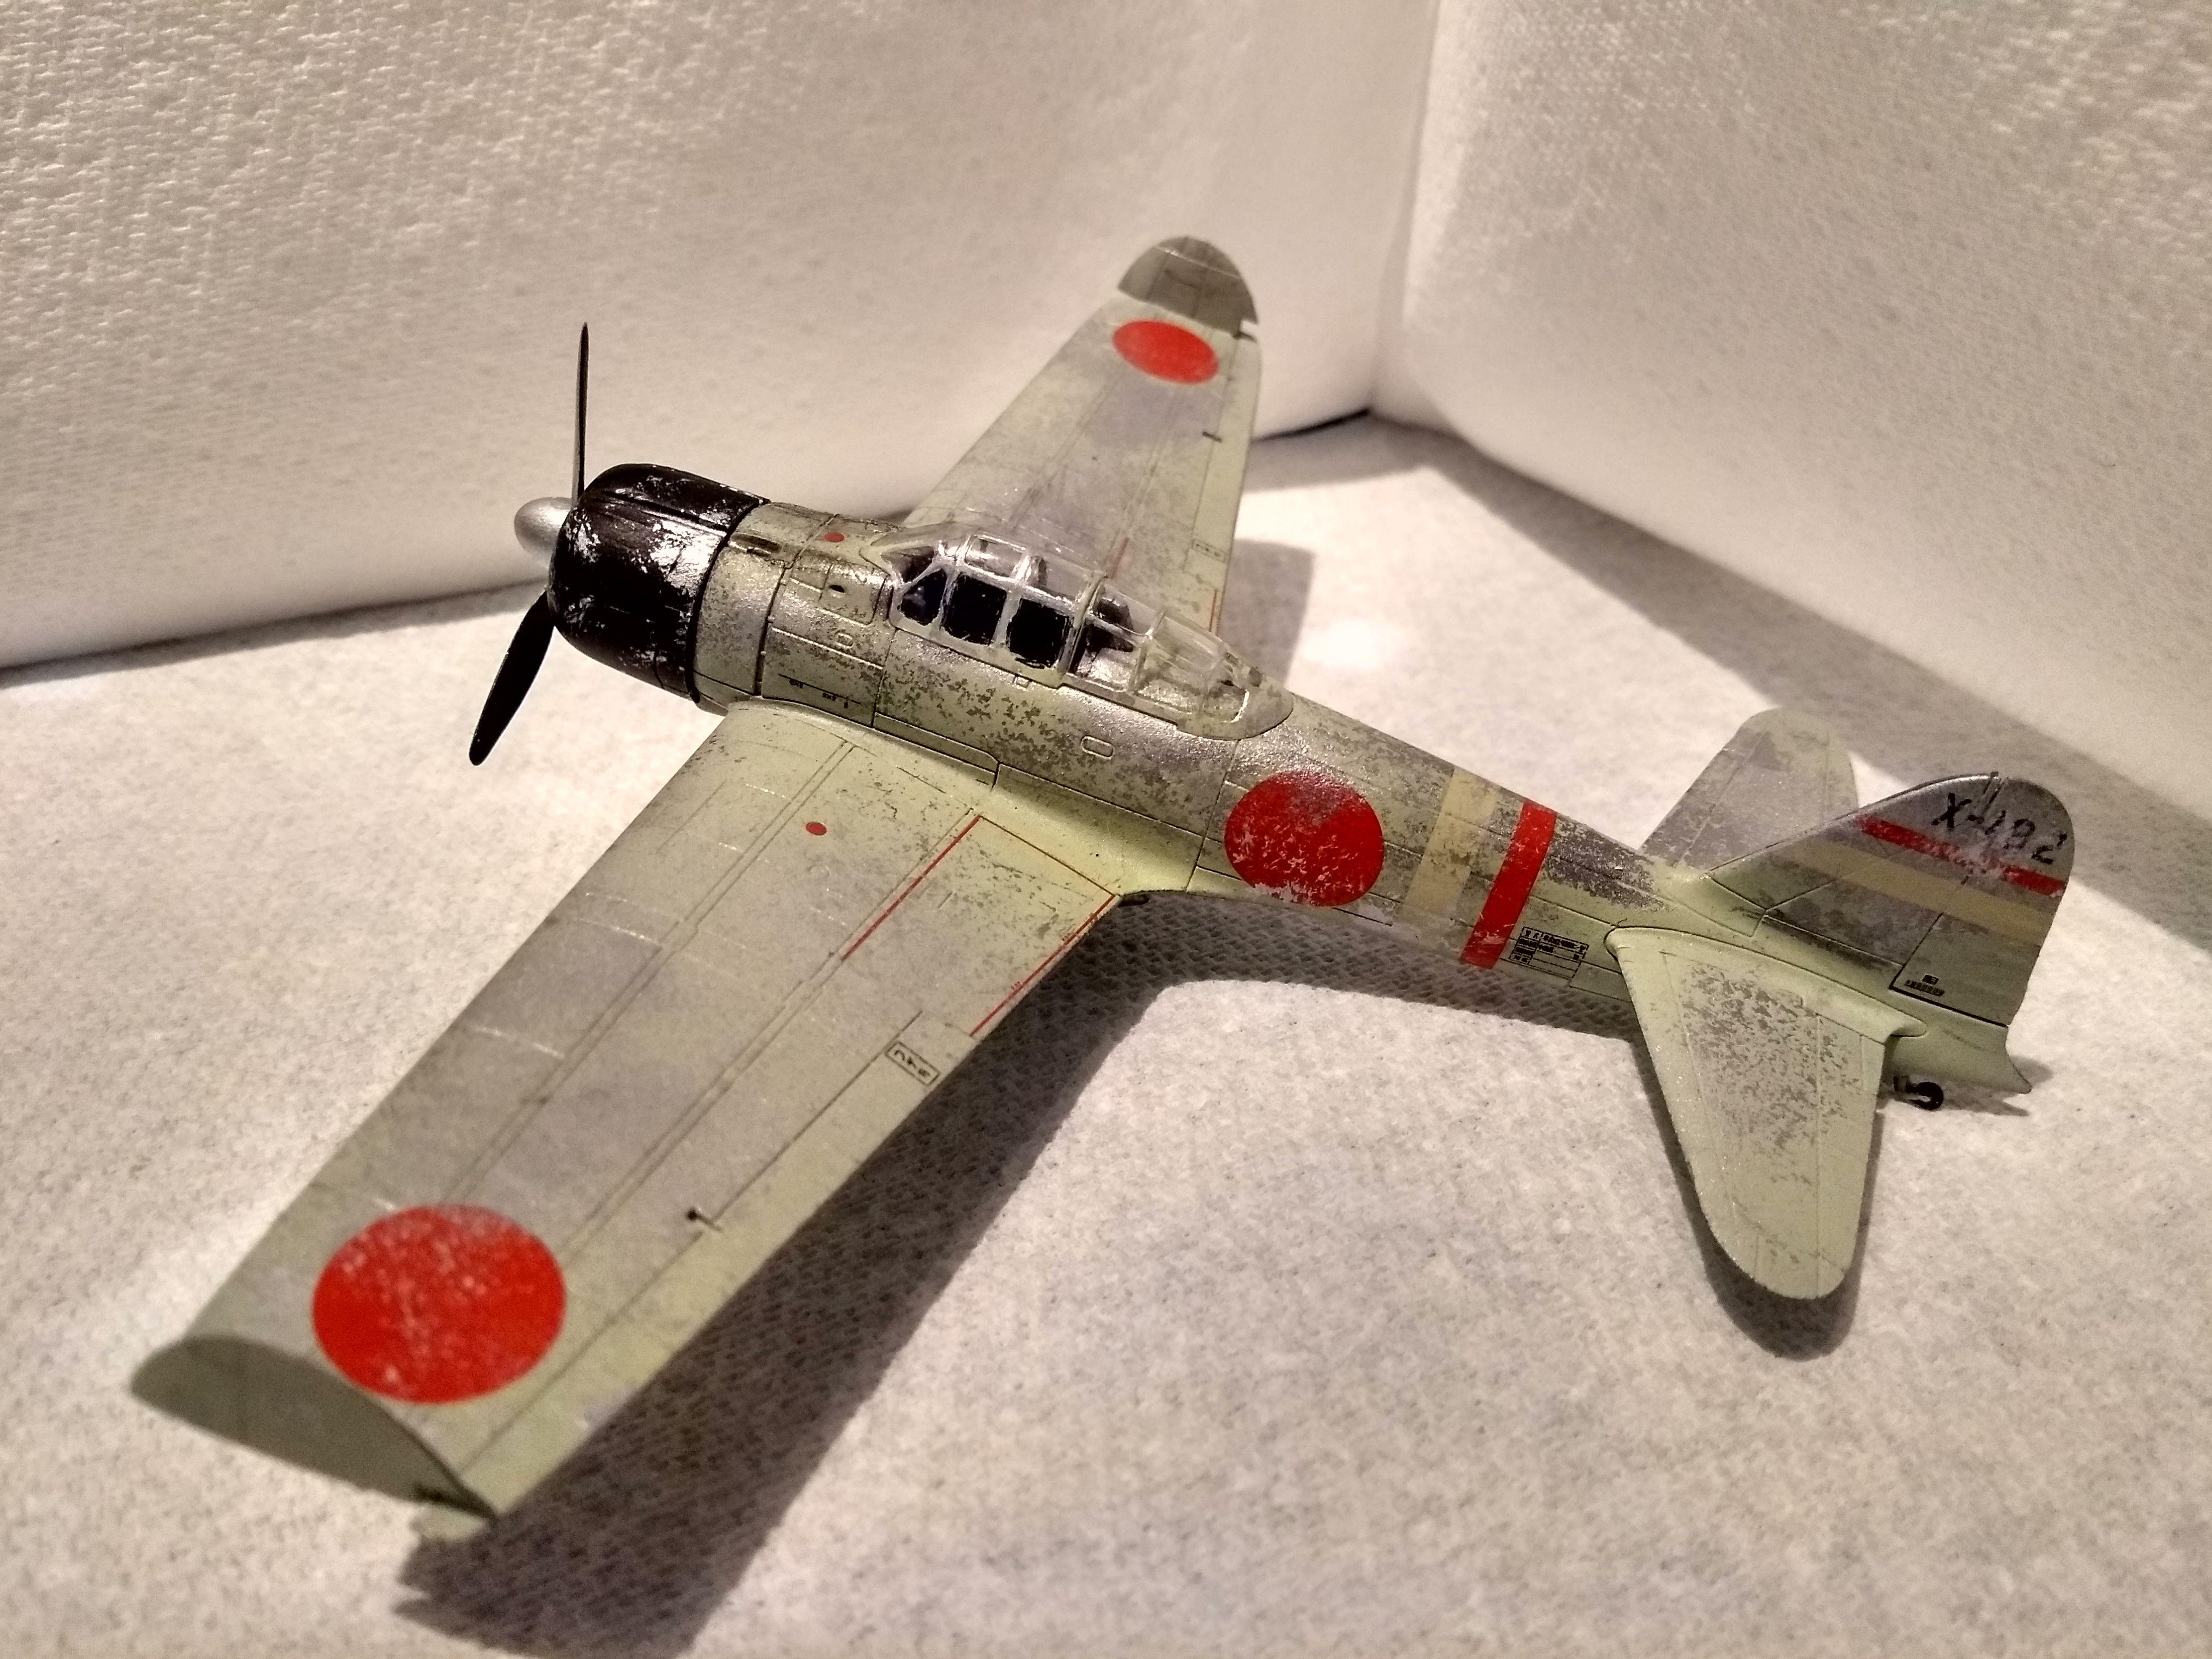 Airfix 1/72 Zero - Ready for Inspection - Aircraft - Britmodeller com